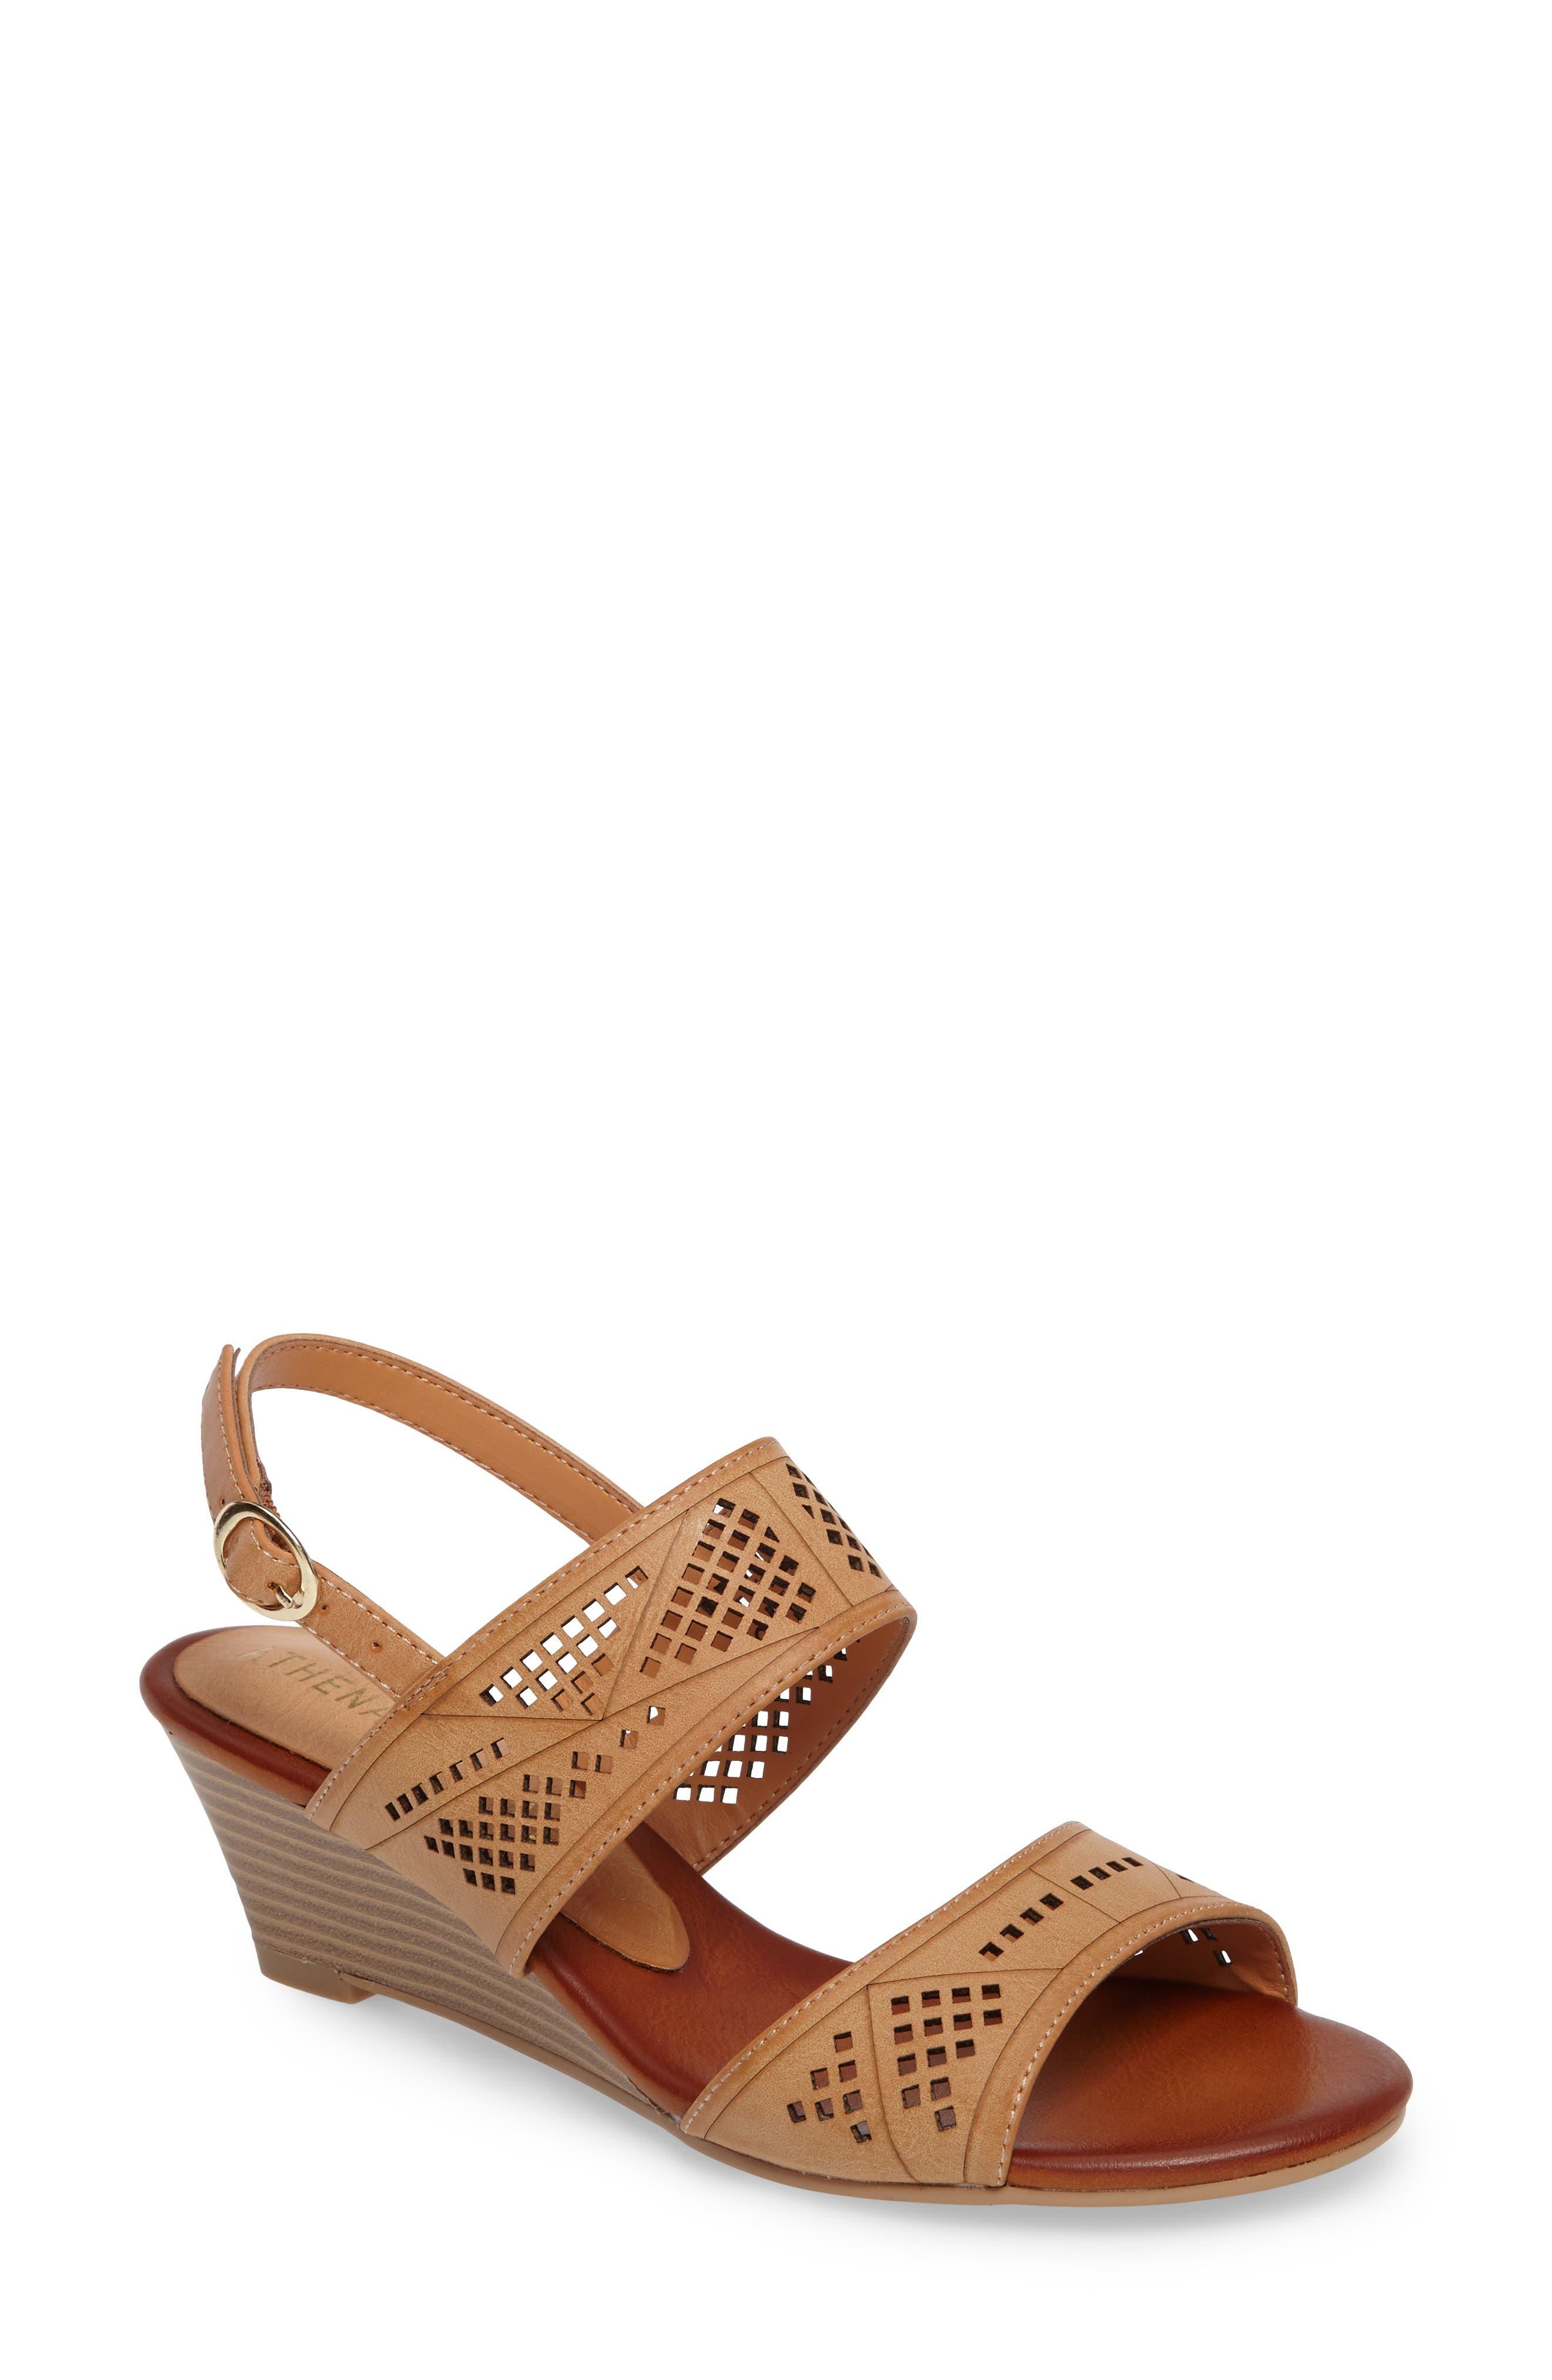 Sparce Perforated Wedge Sandal,                             Main thumbnail 2, color,